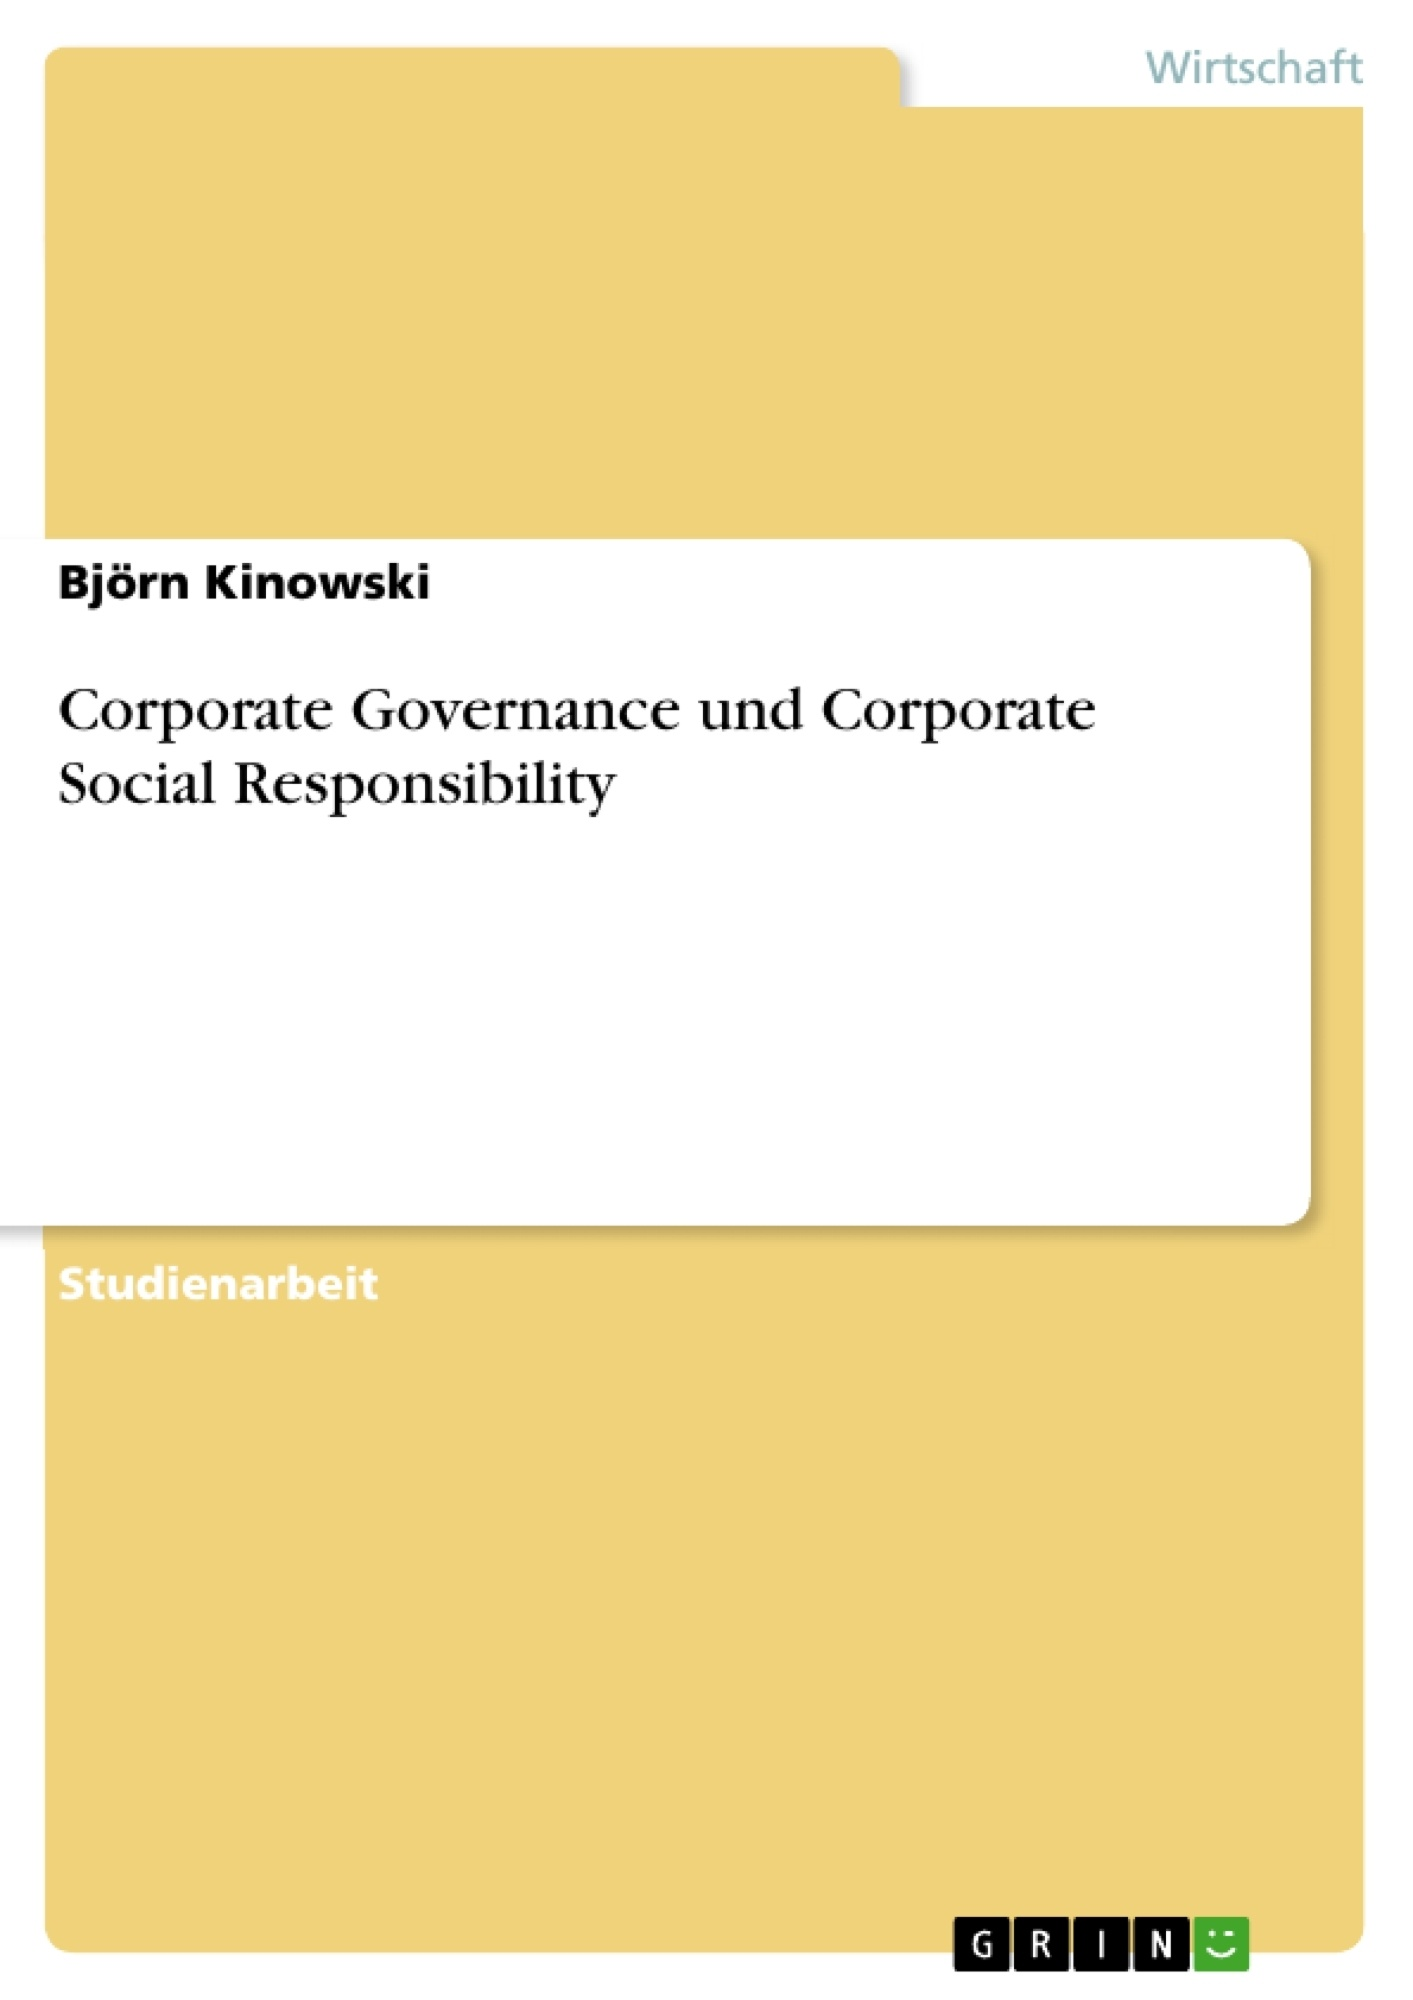 Titel: Corporate Governance und Corporate Social Responsibility